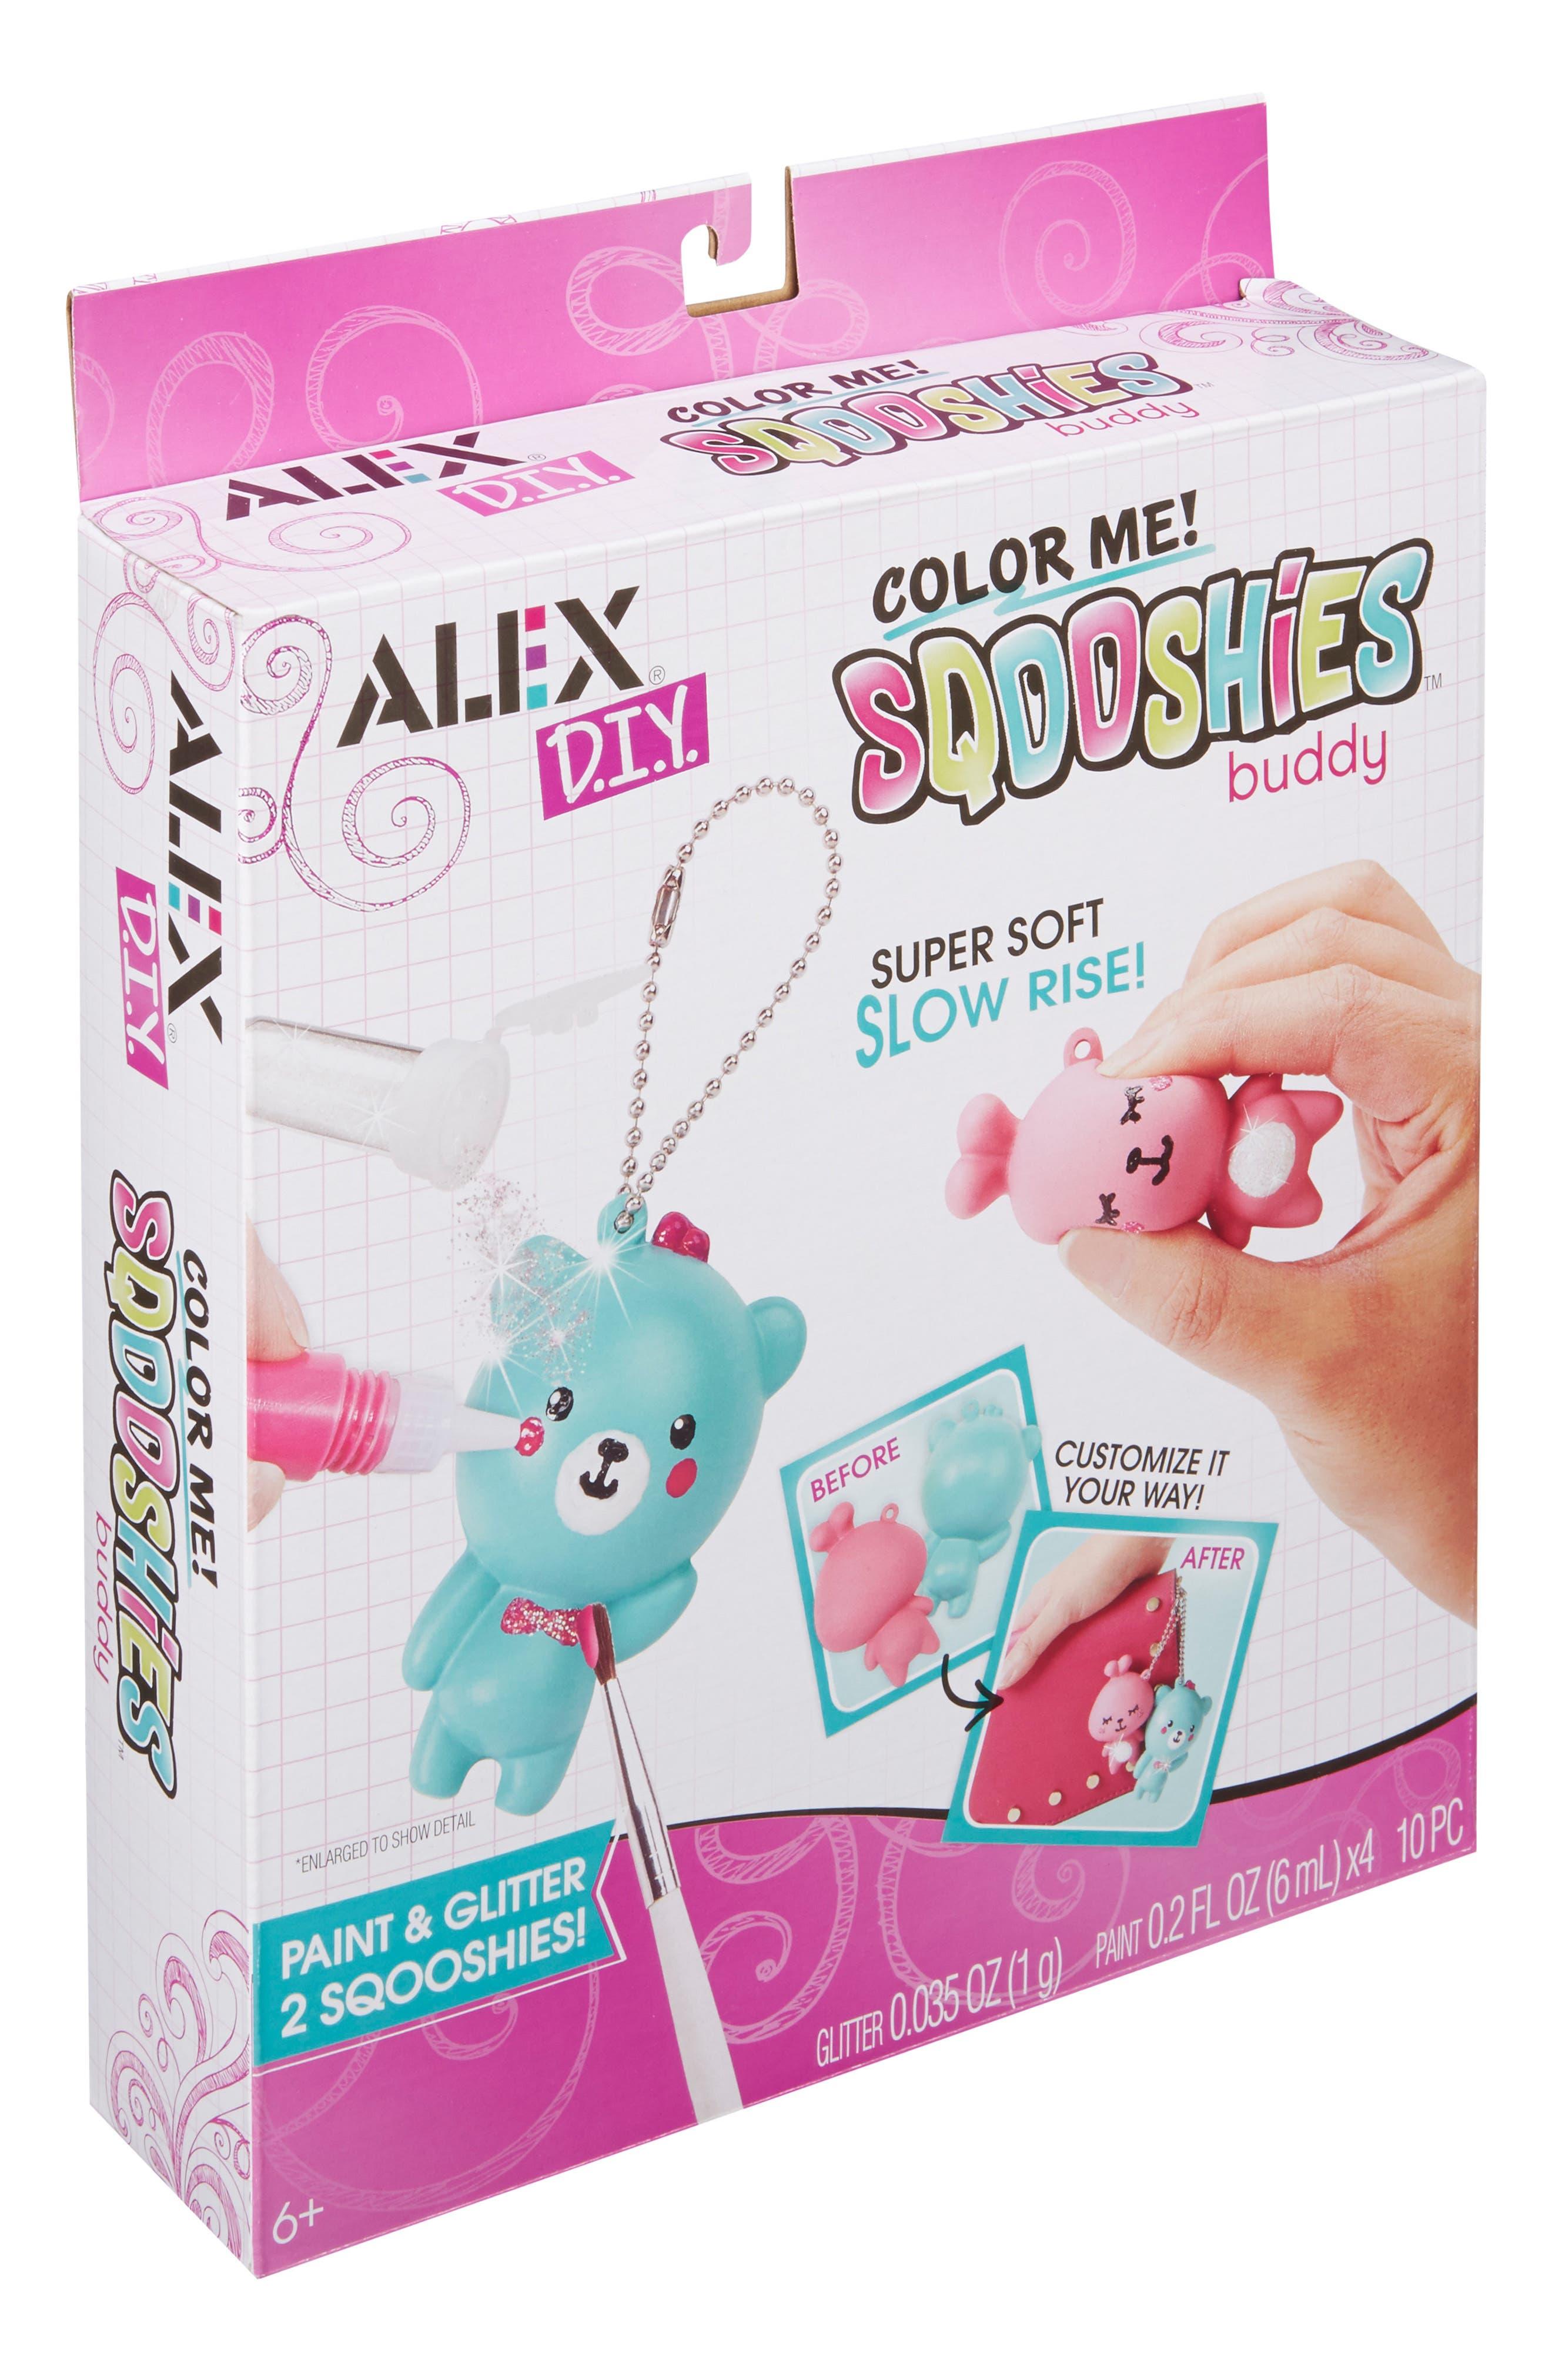 ALEX<SUP>®</SUP> TOYS, DIY Color Me Sqooshies - Buddy, Alternate thumbnail 5, color, 960